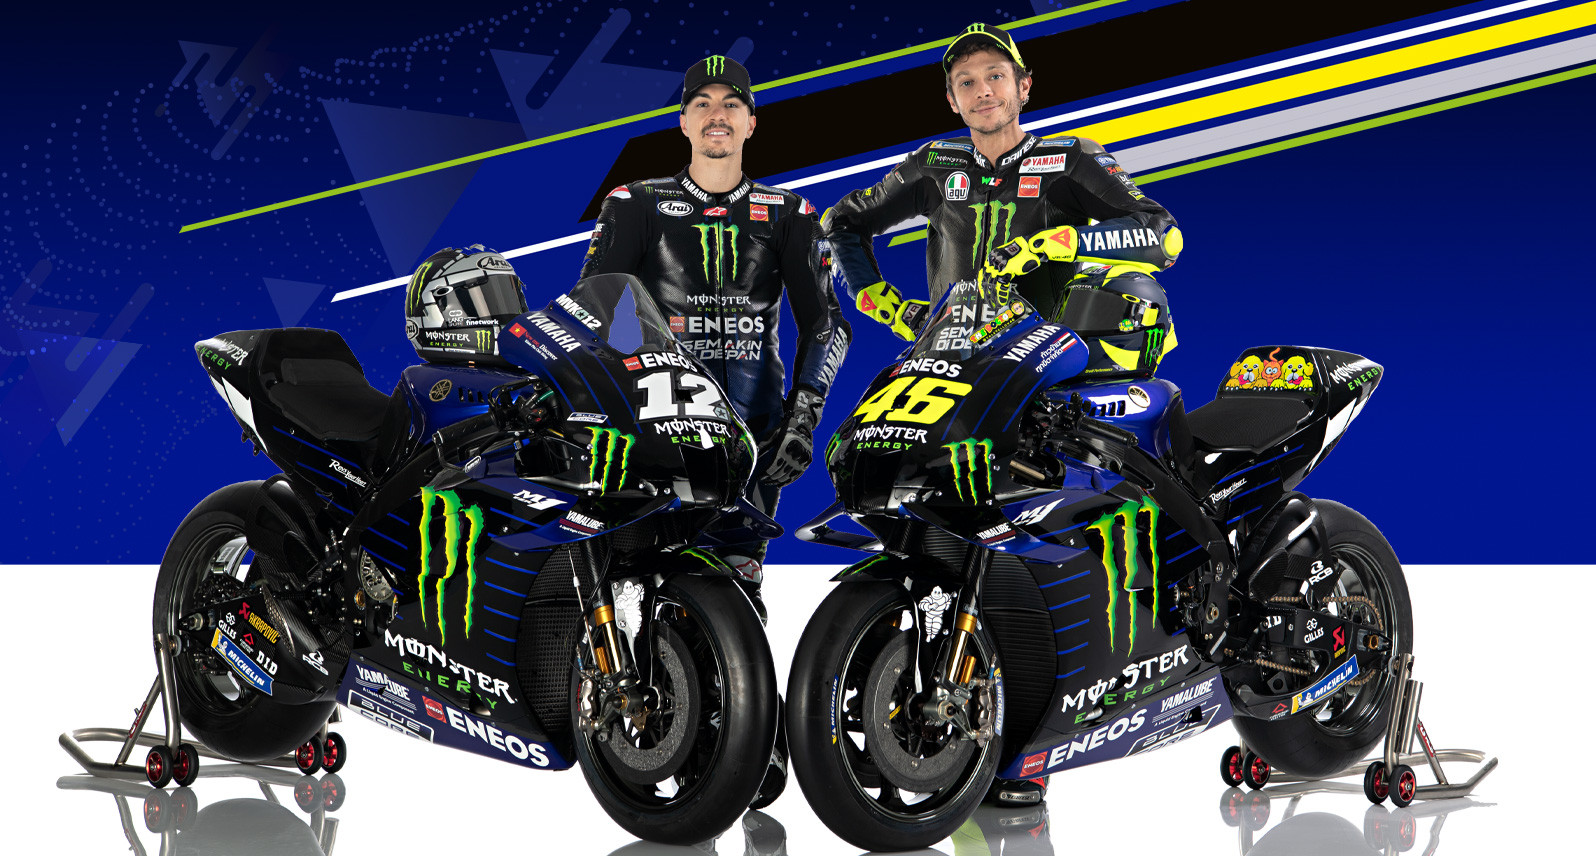 Motogp Monster Energy Yamaha Team Reveals 2020 Livery Roadracing World Magazine Motorcycle Riding Racing Tech News